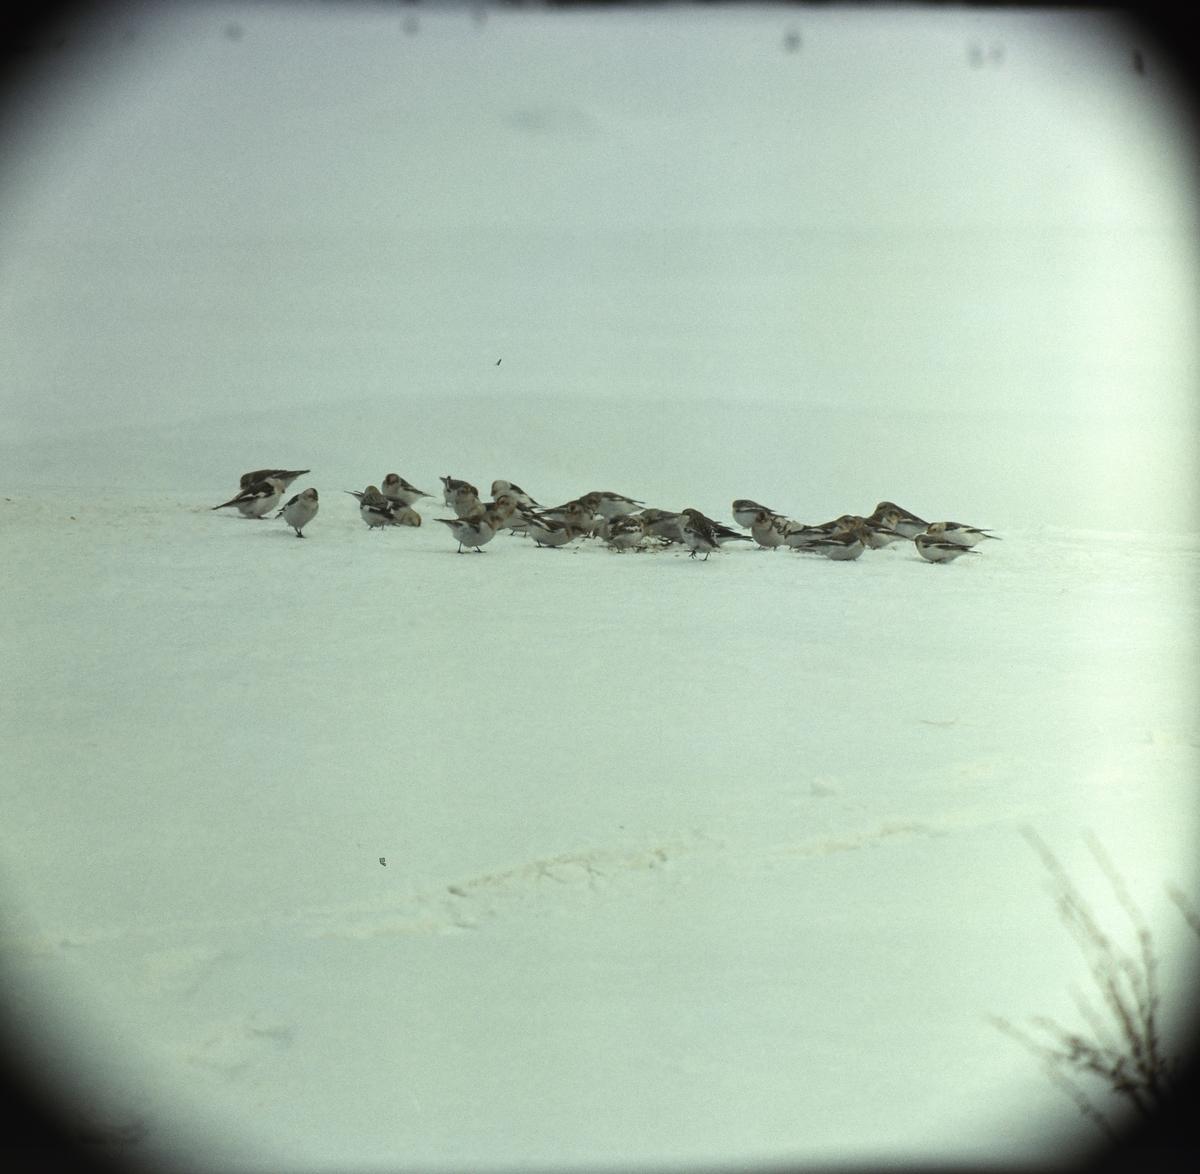 En flock snösparvar sitter på marken.